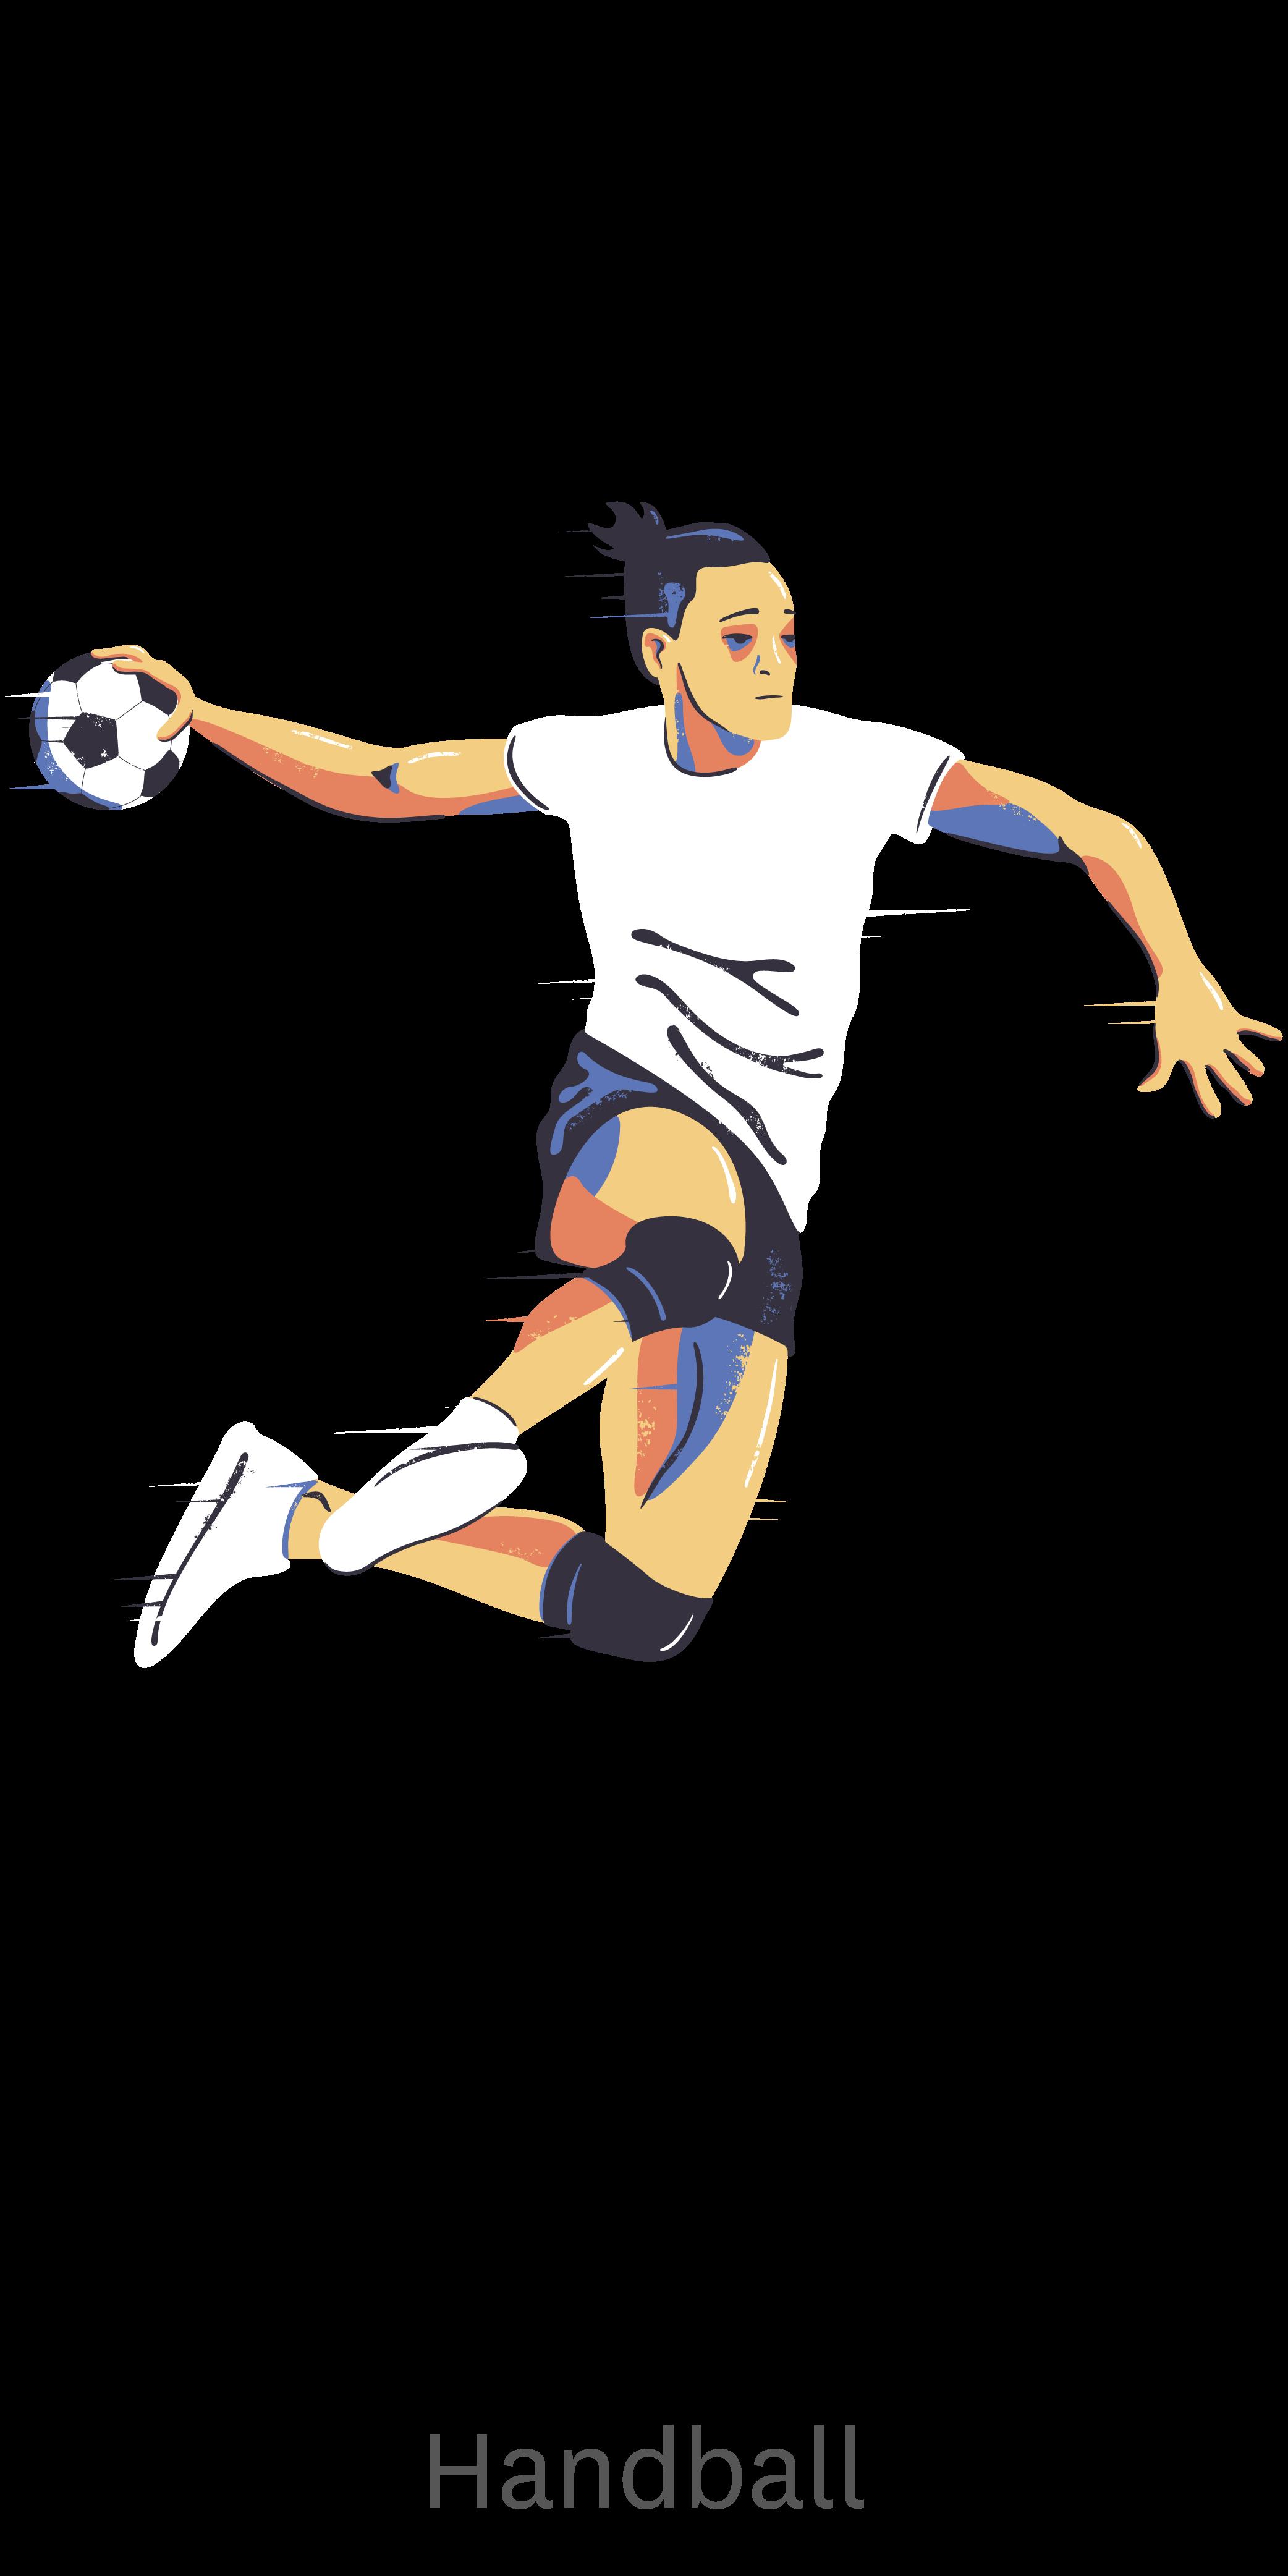 movement_sport_handball.png